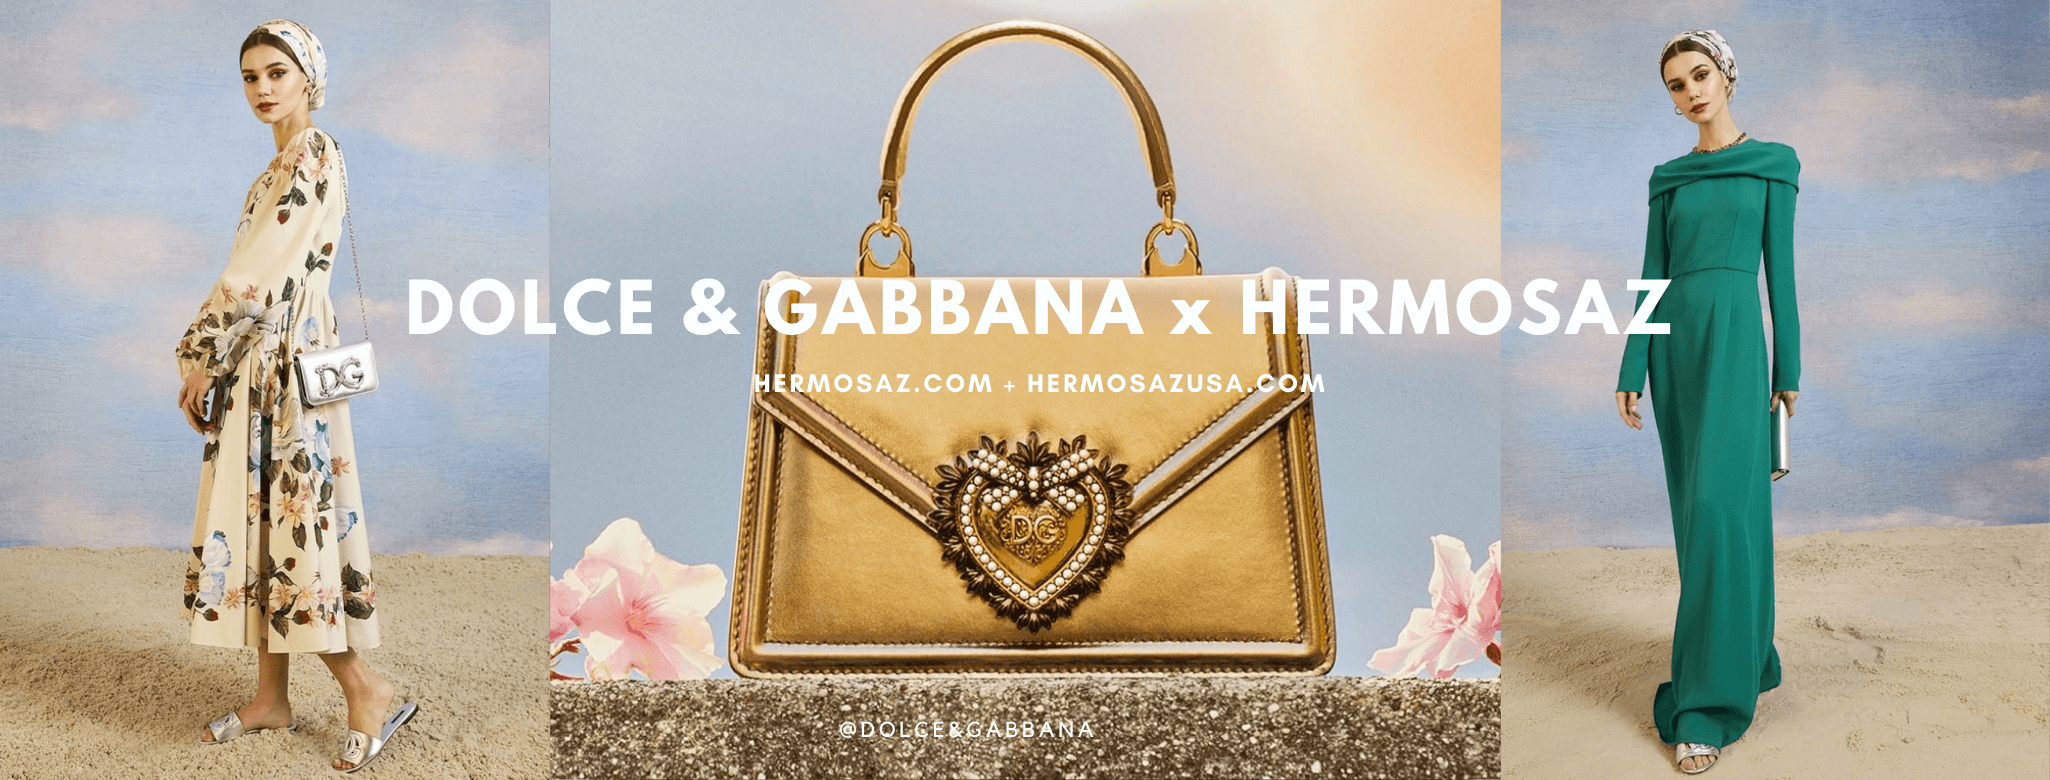 Dolce & Gabbana x Hermosaz